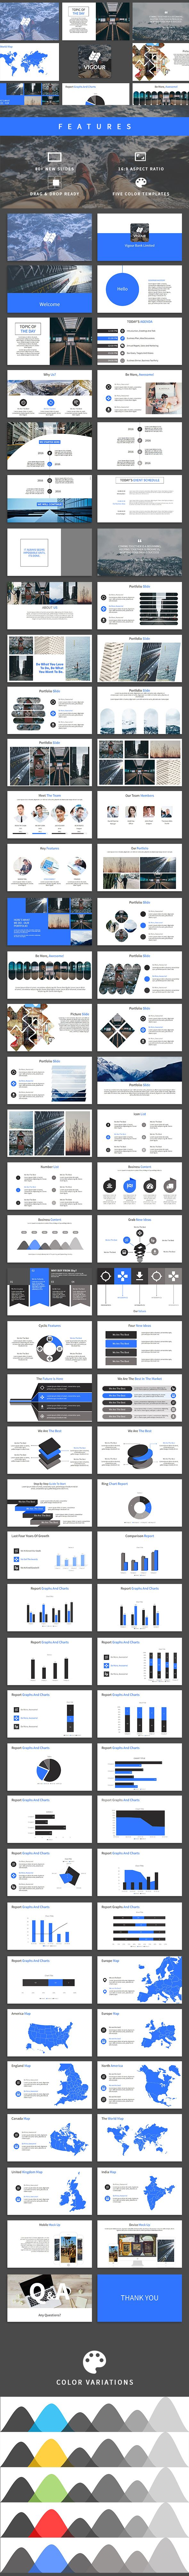 Vigour PowerPoint Template. Download here: https://graphicriver.net/item/vigour-powerpoint-/17110180?ref=ksioks